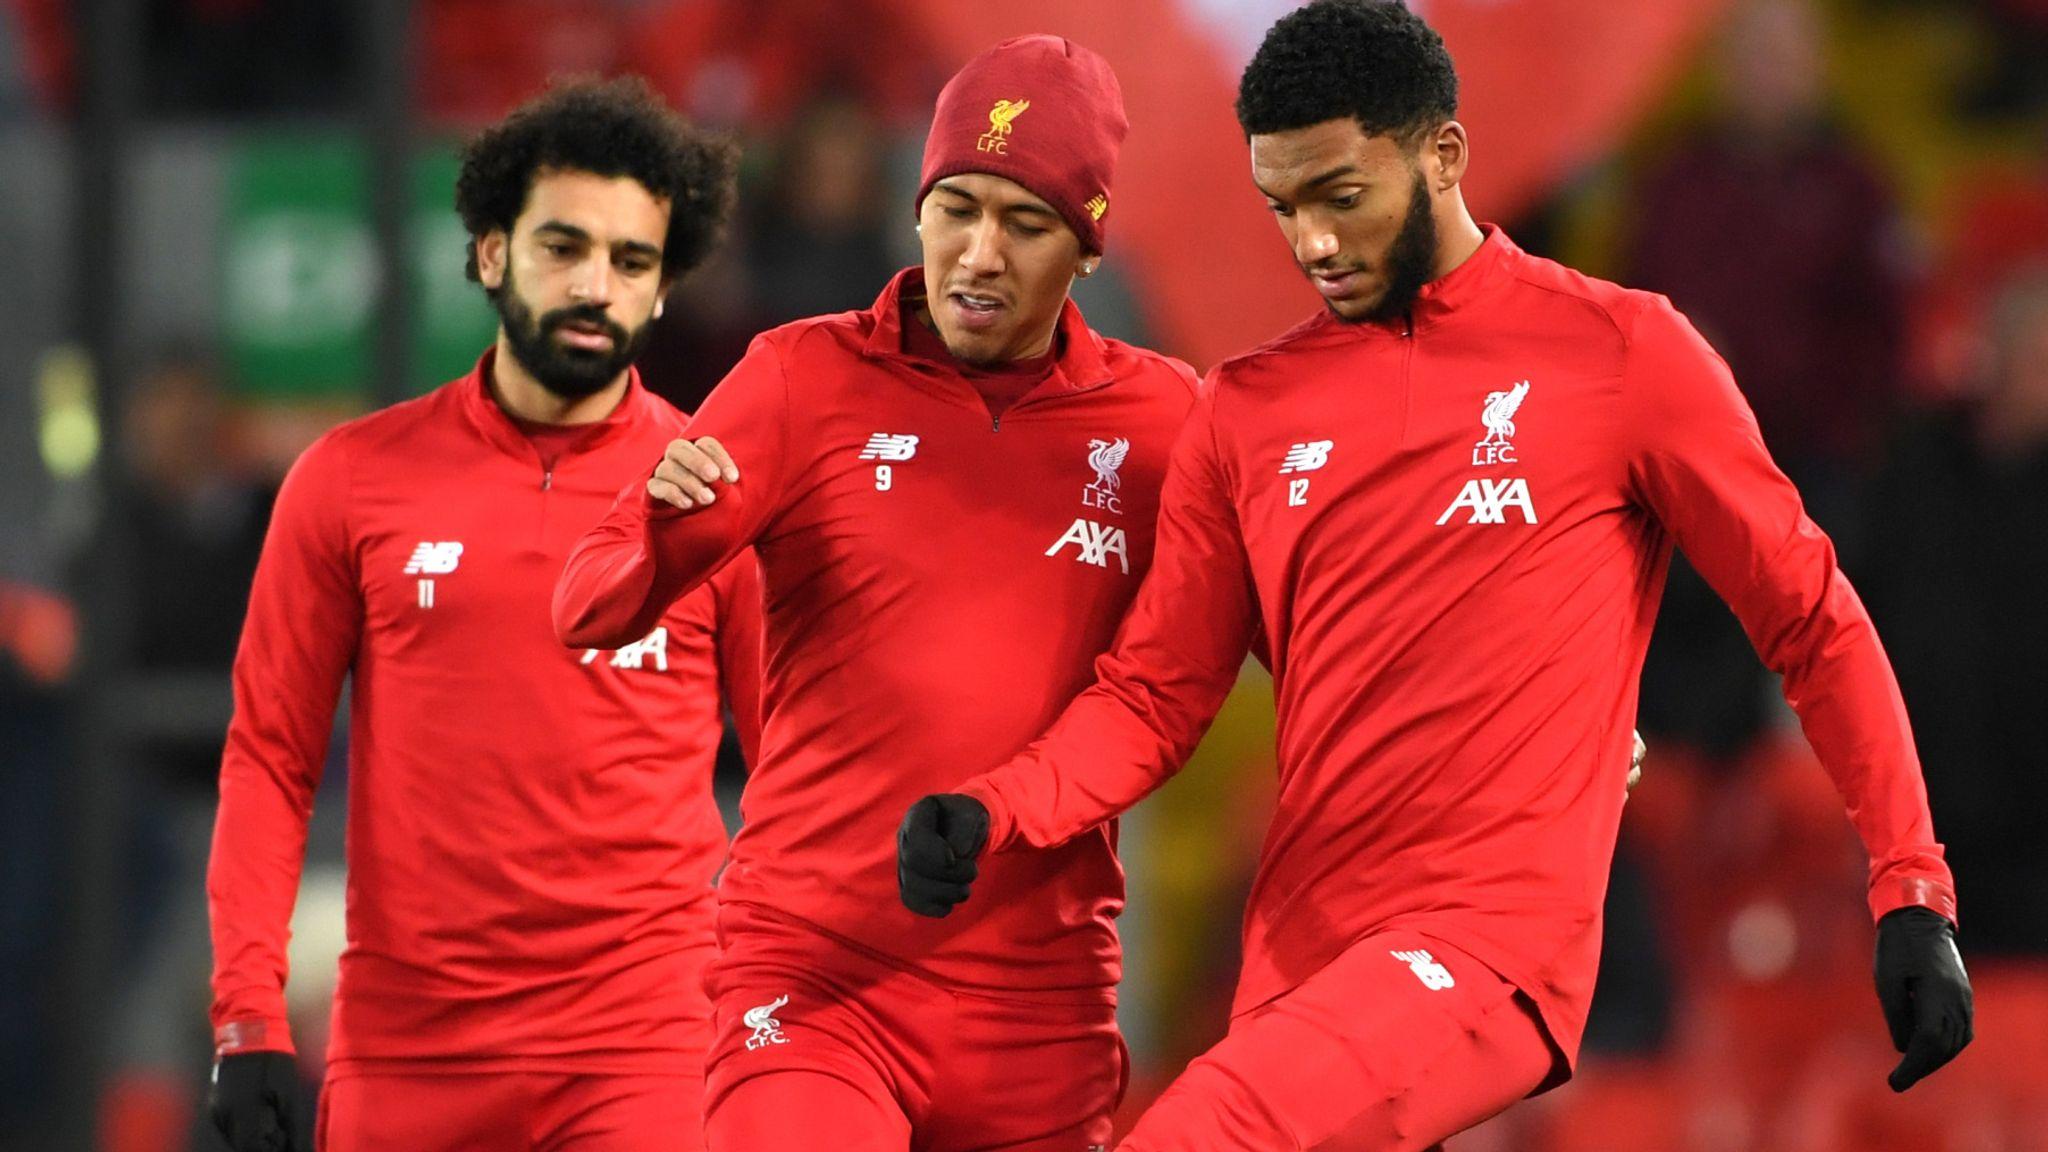 Liverpool vs Man Utd LIVE!